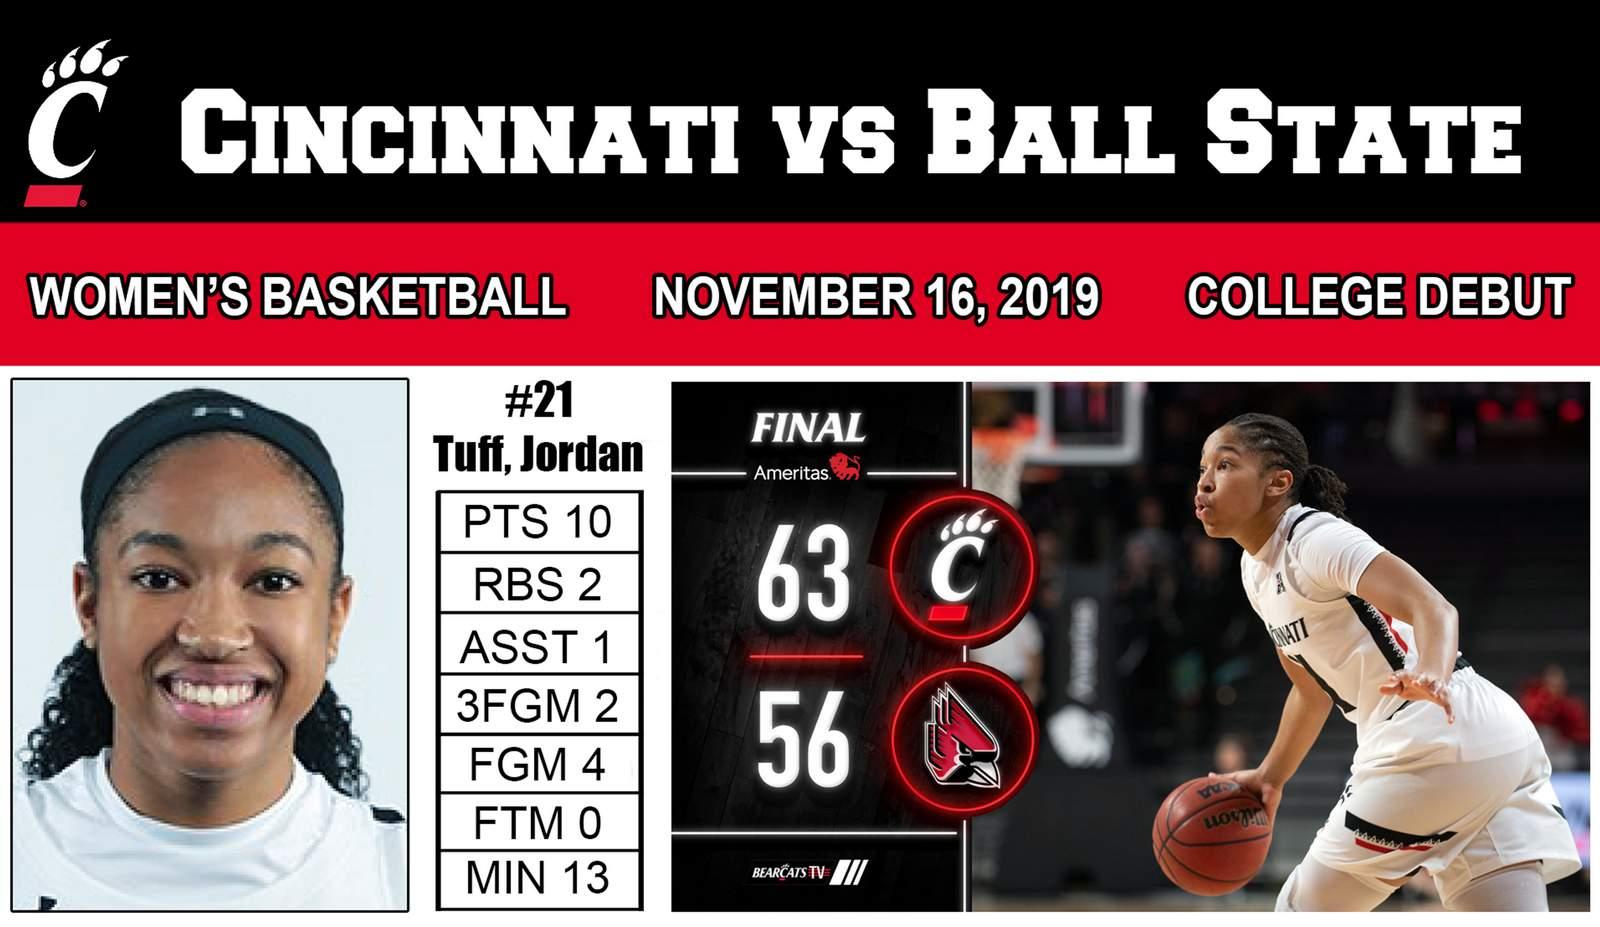 Cincinnati vs Ball State